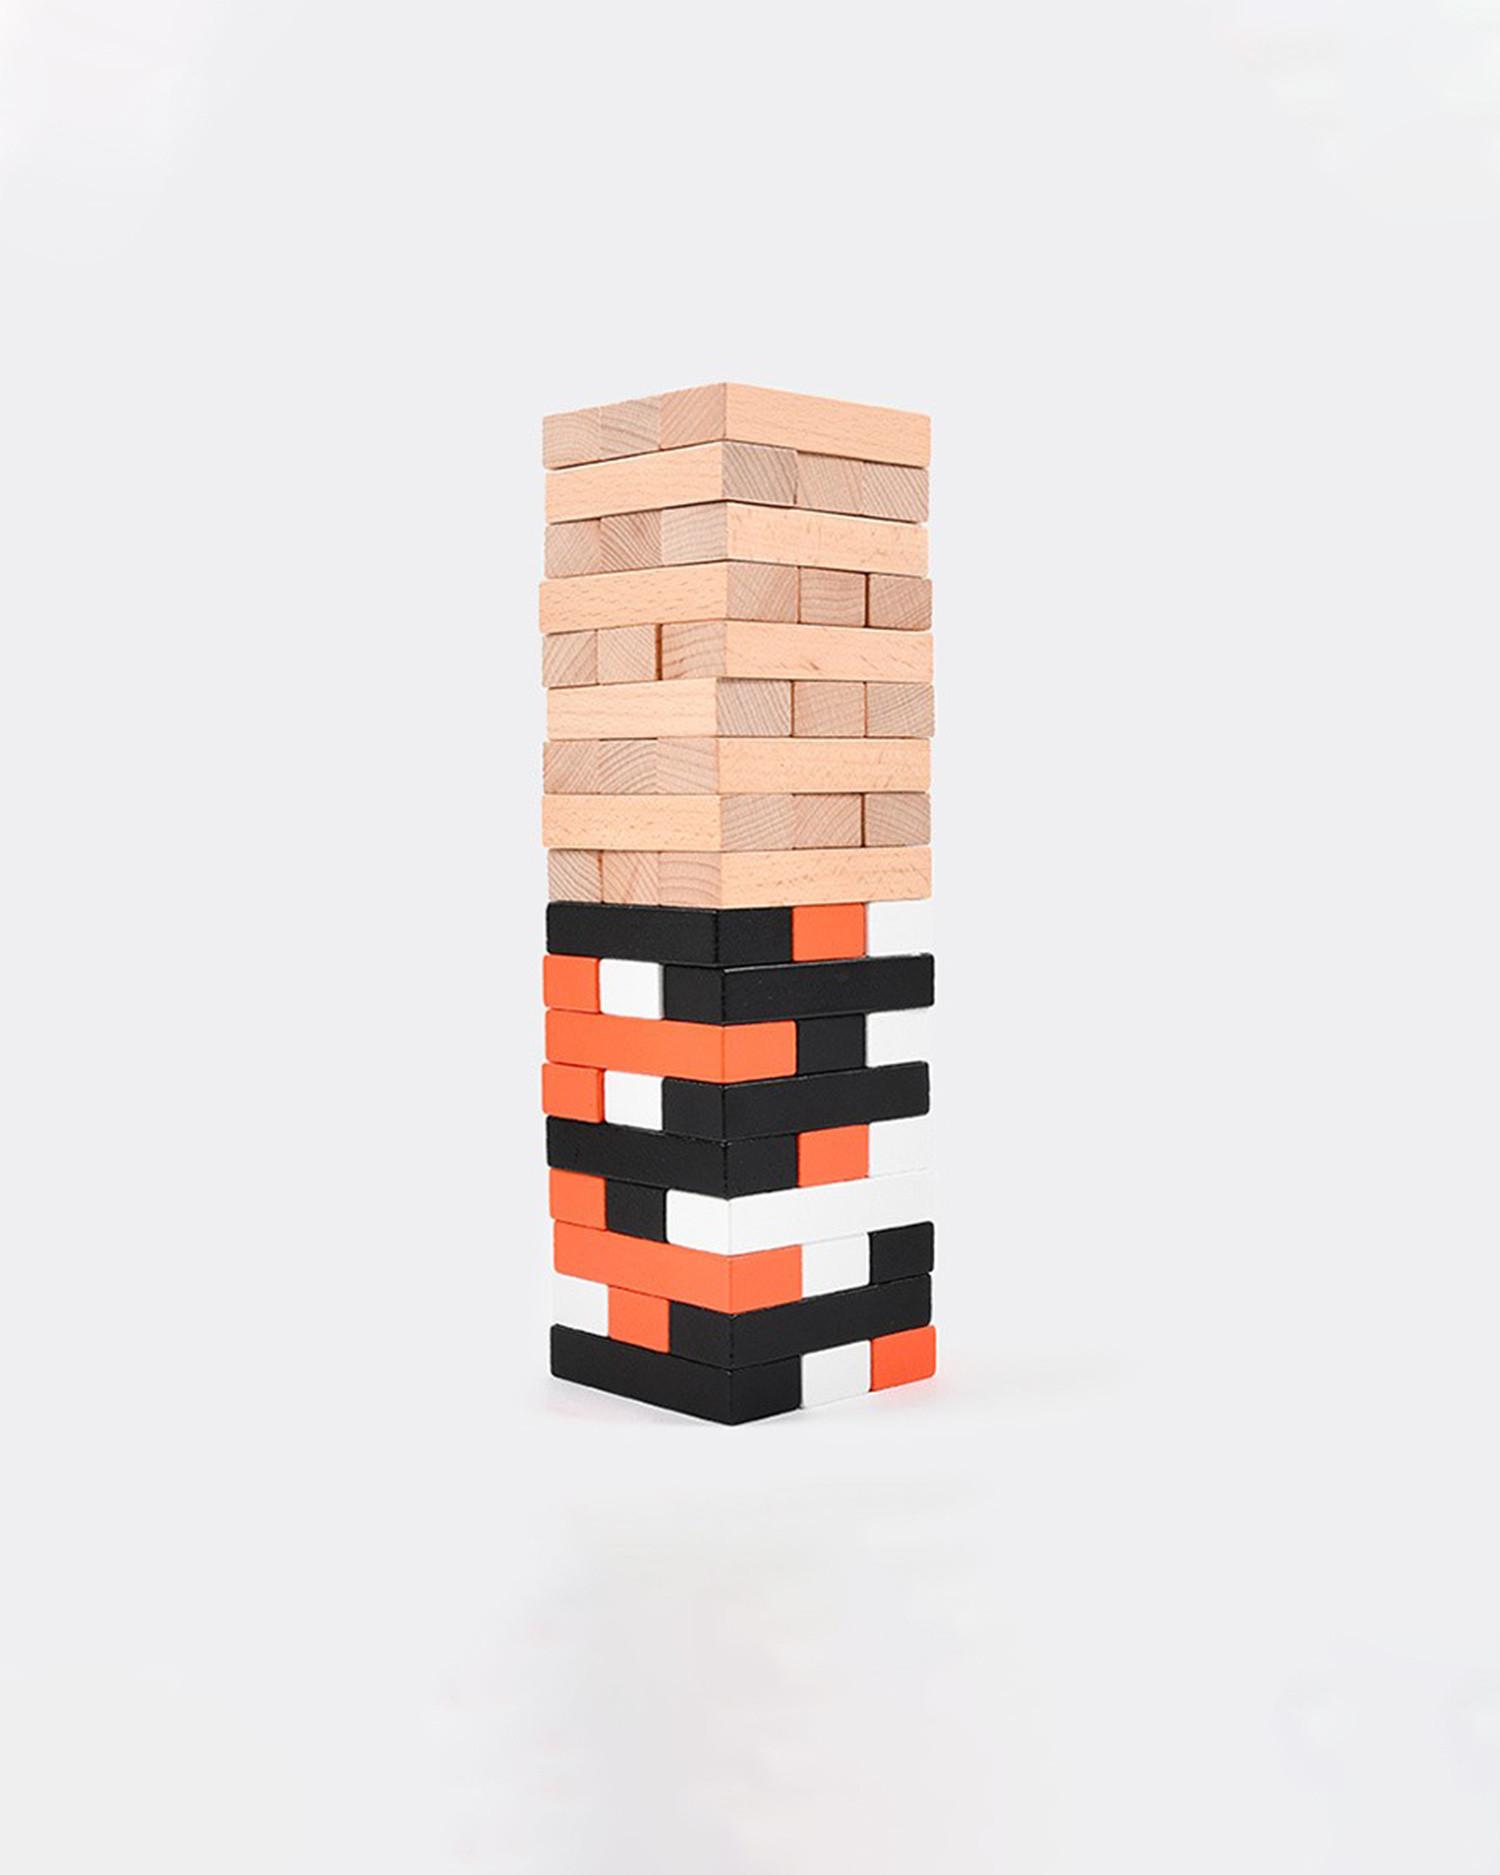 Carhartt Stackling Blocks Game Wood Multicolor